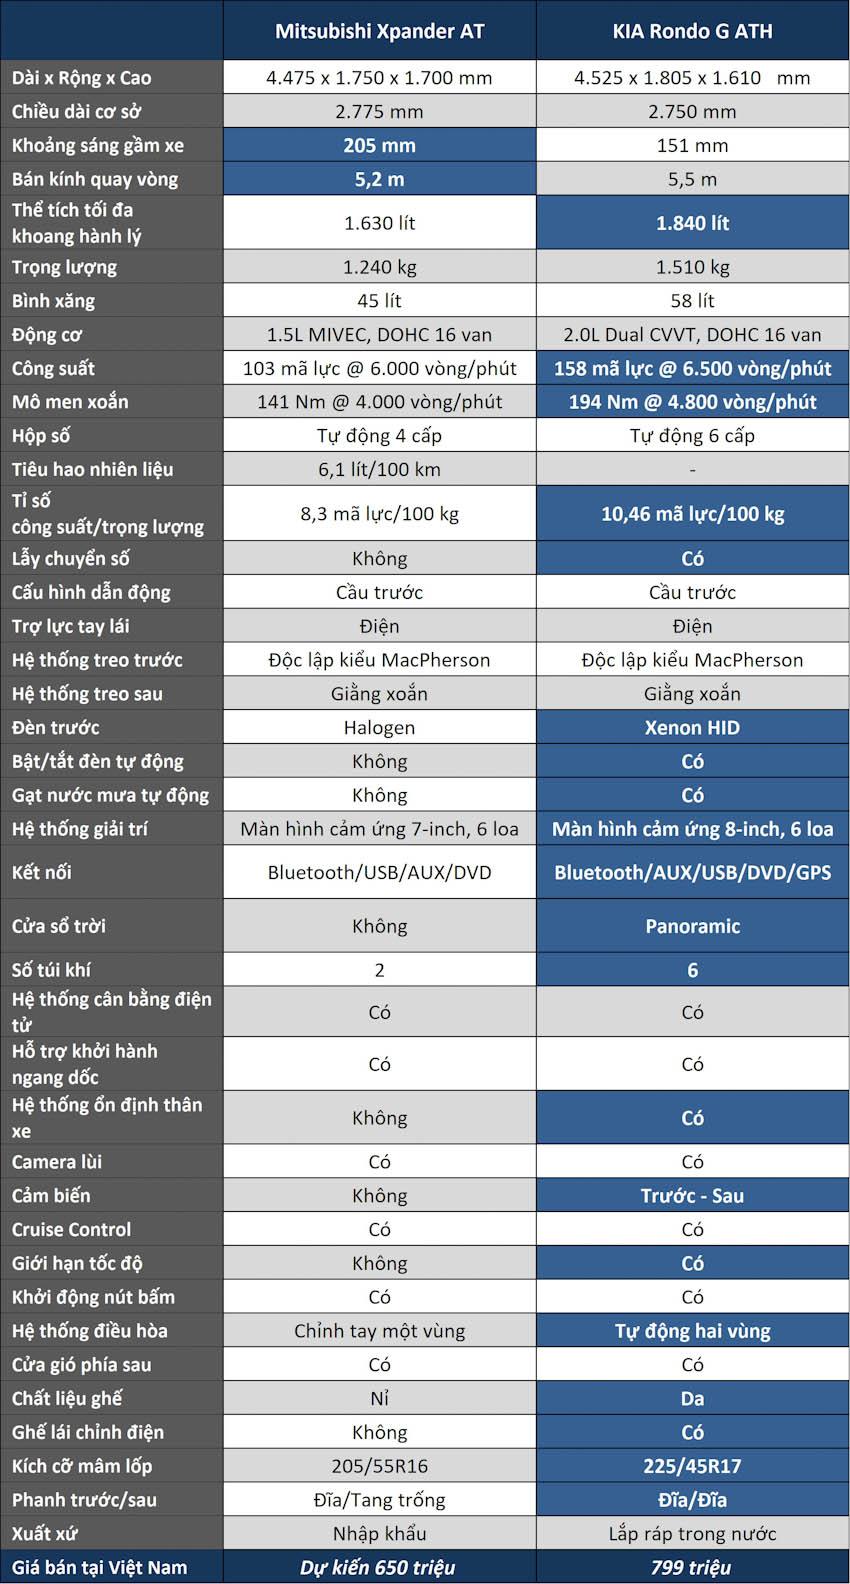 Phân khúc MPV 7 chỗ, chọn Mitsubishi Xpander hay KIA Rondo?